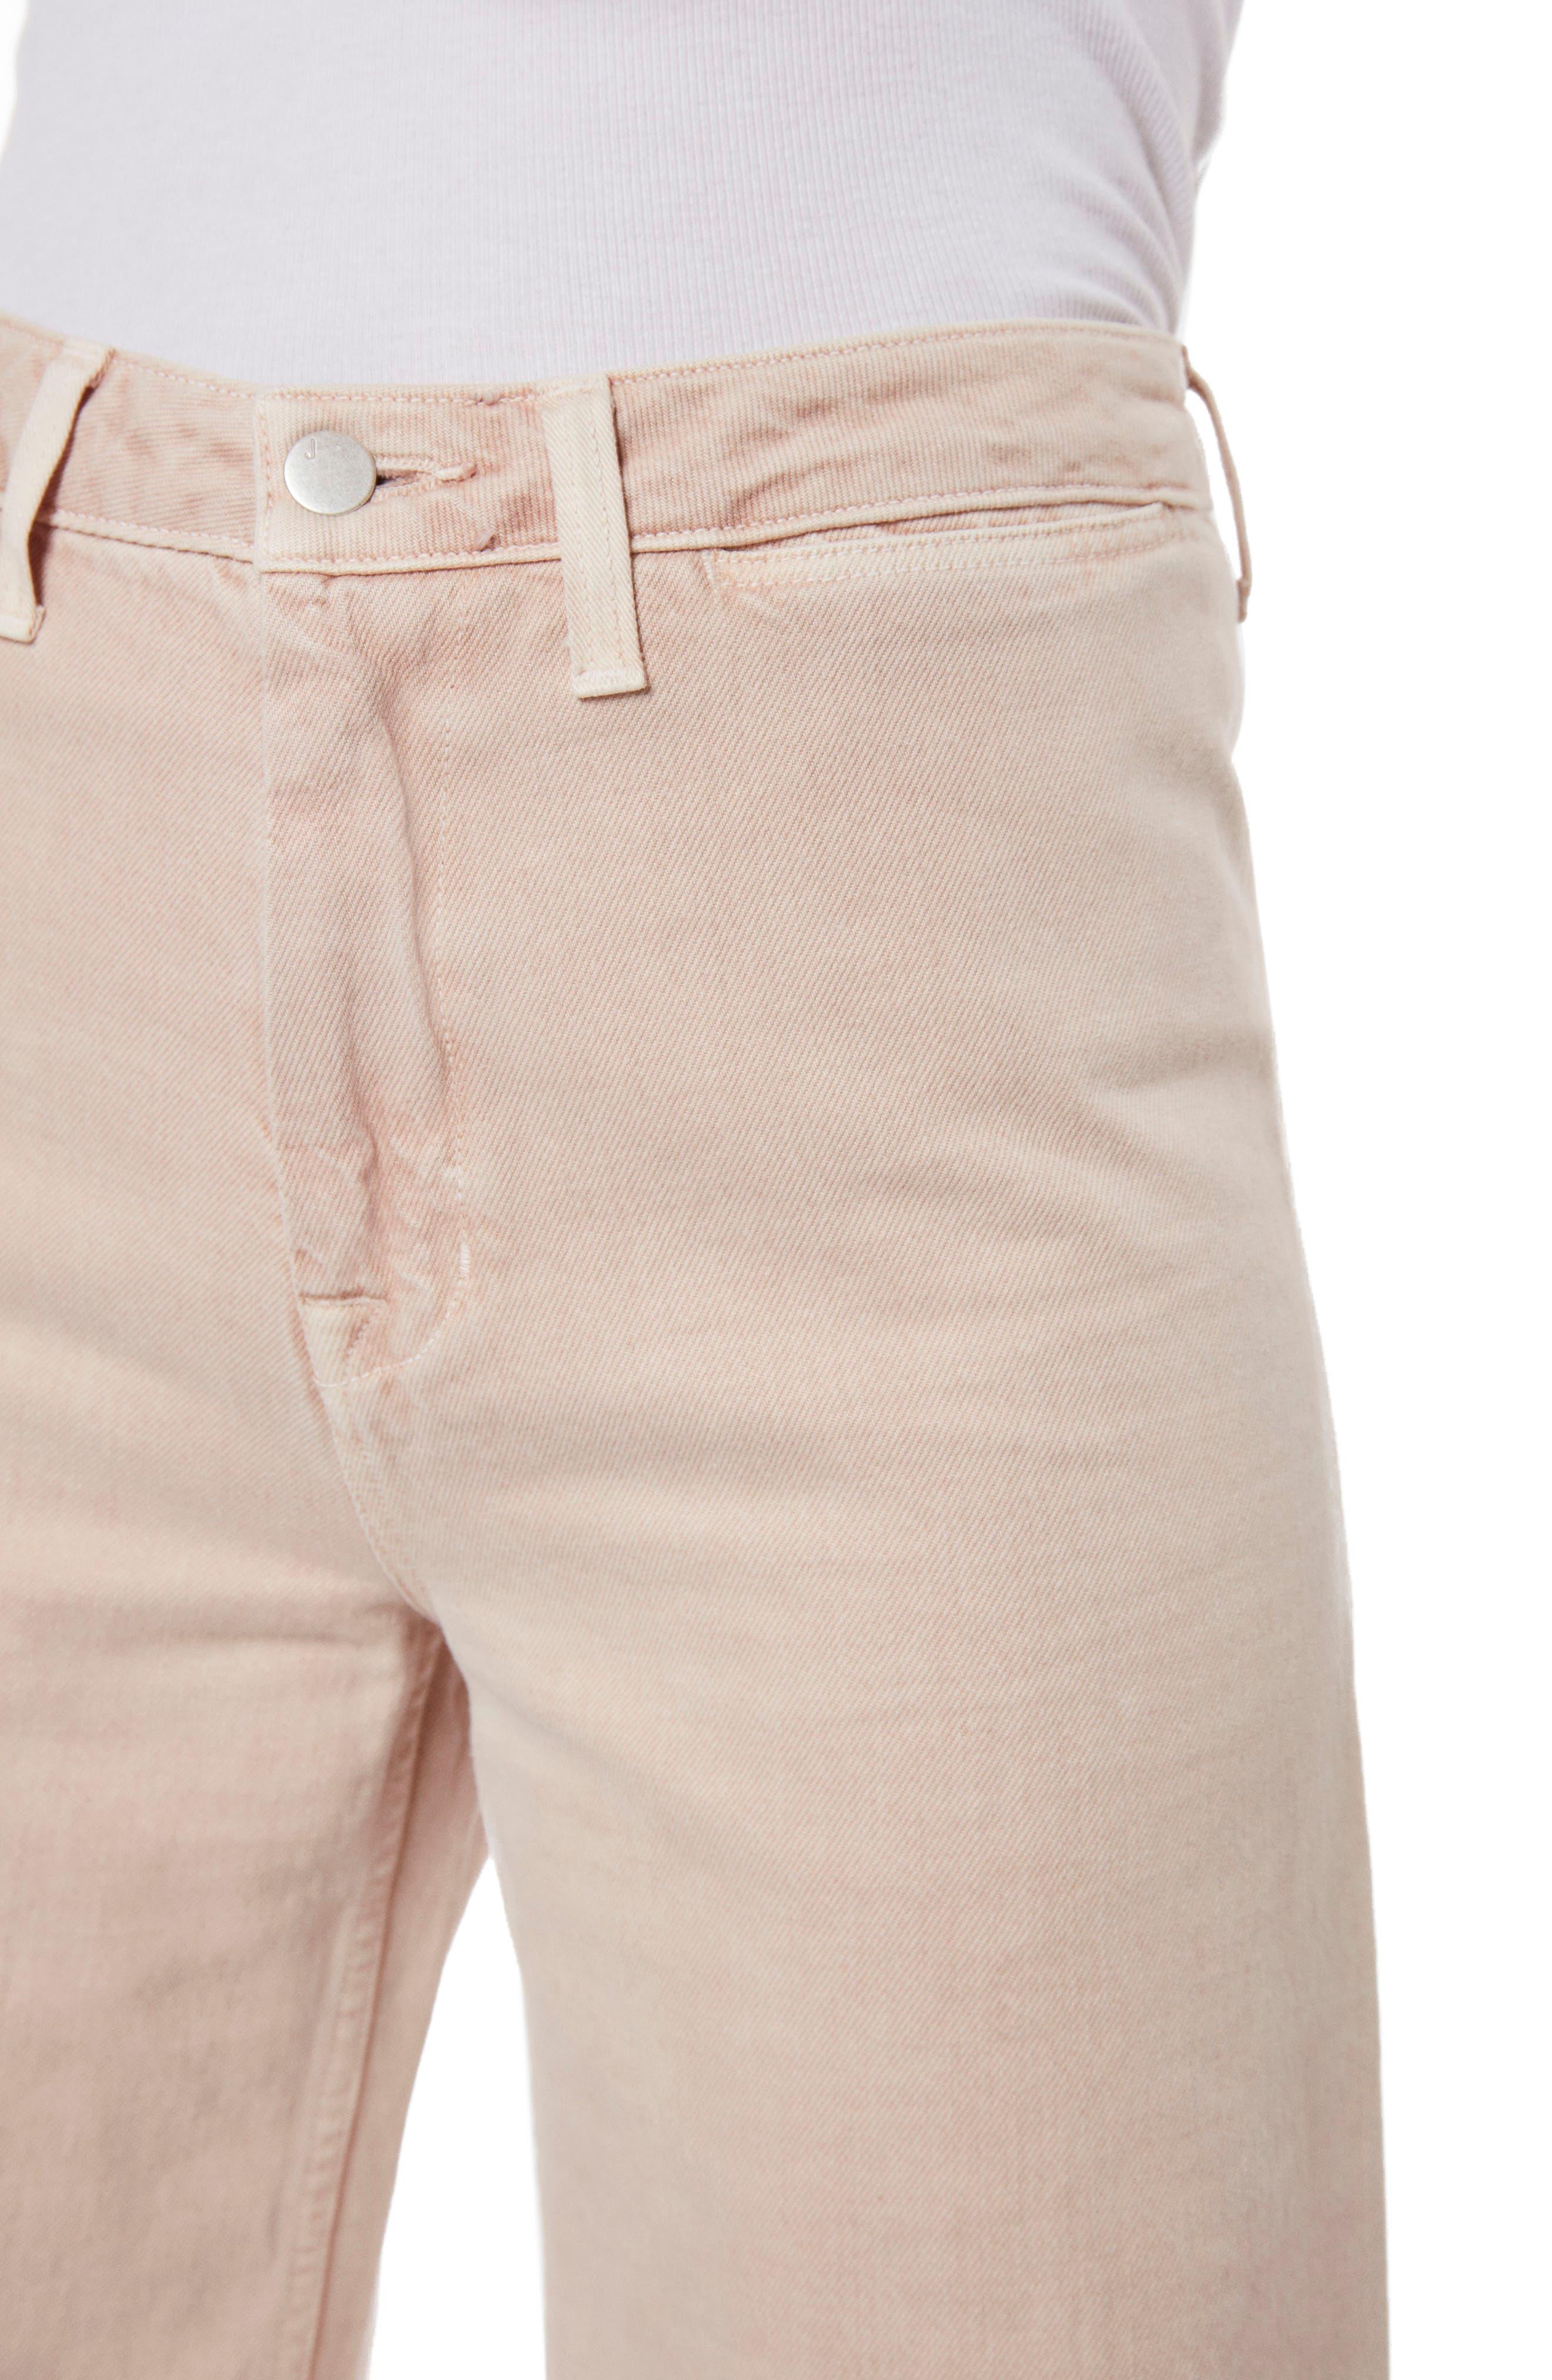 Hallton High Waist Wide Leg Jeans,                             Alternate thumbnail 4, color,                             Memory